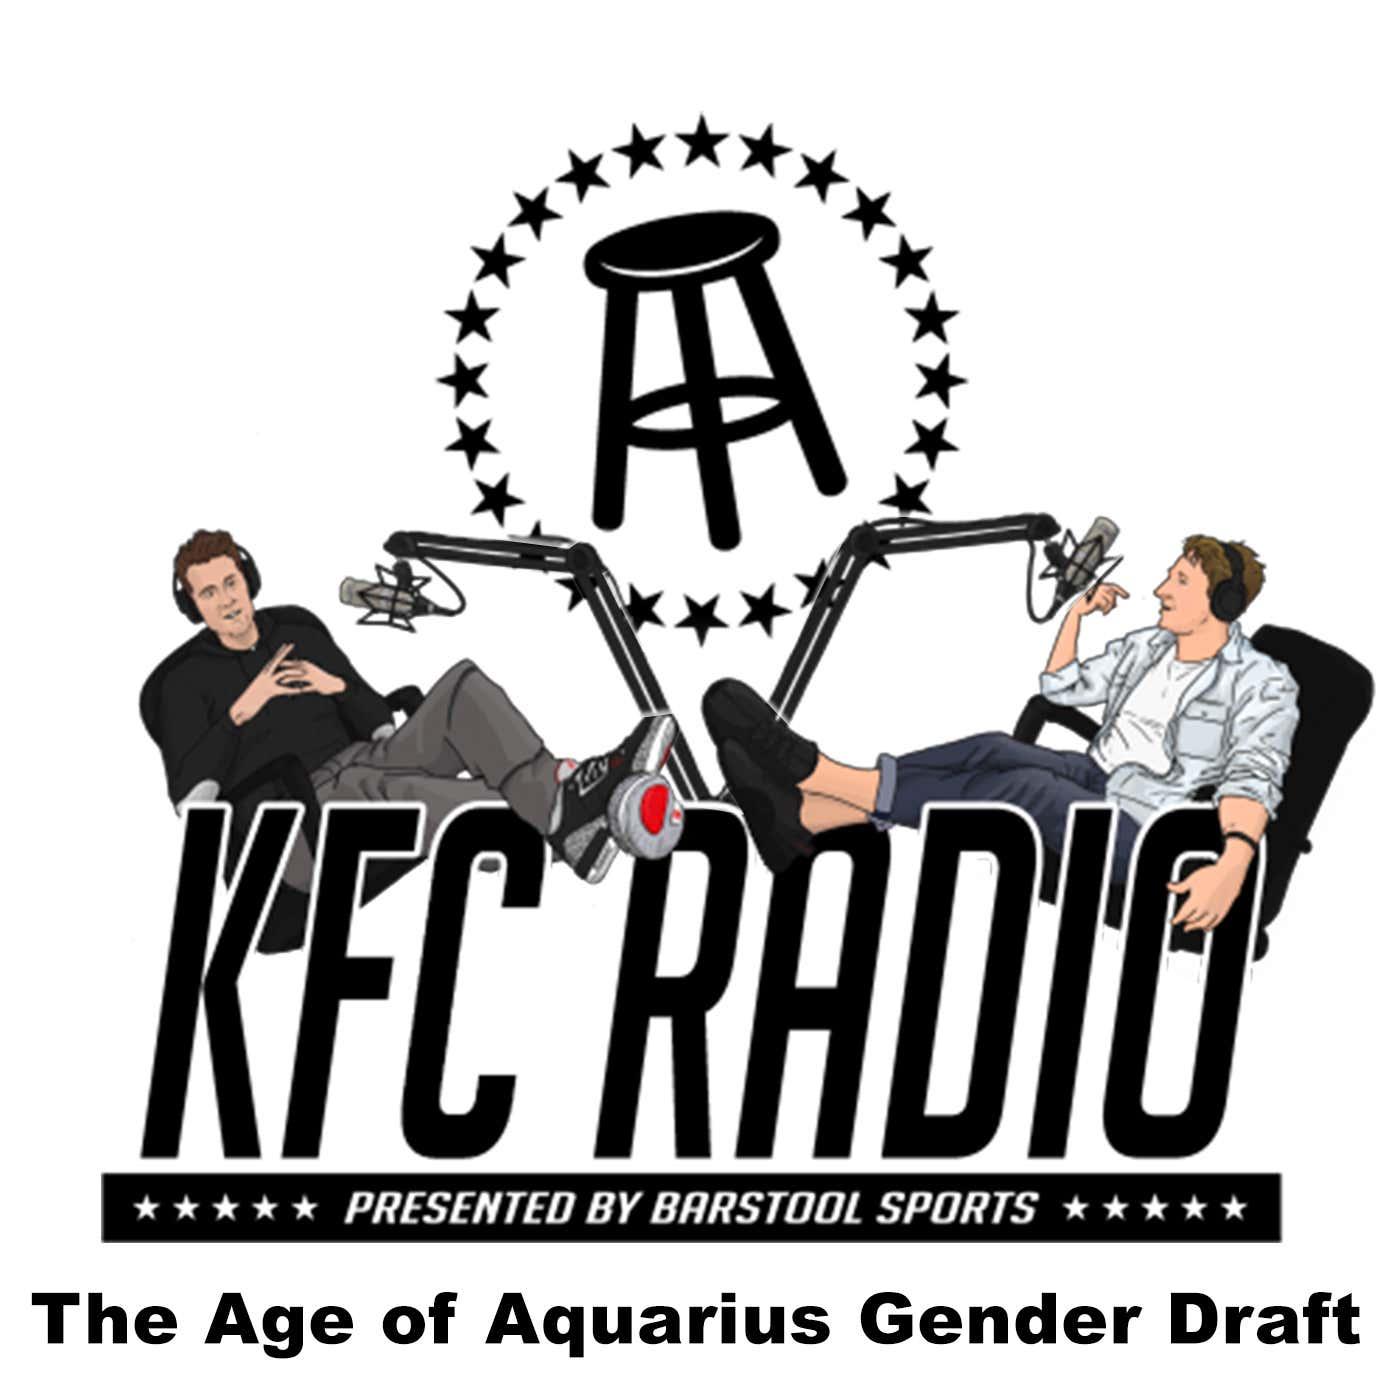 The Age of Aquarius Gender Draft